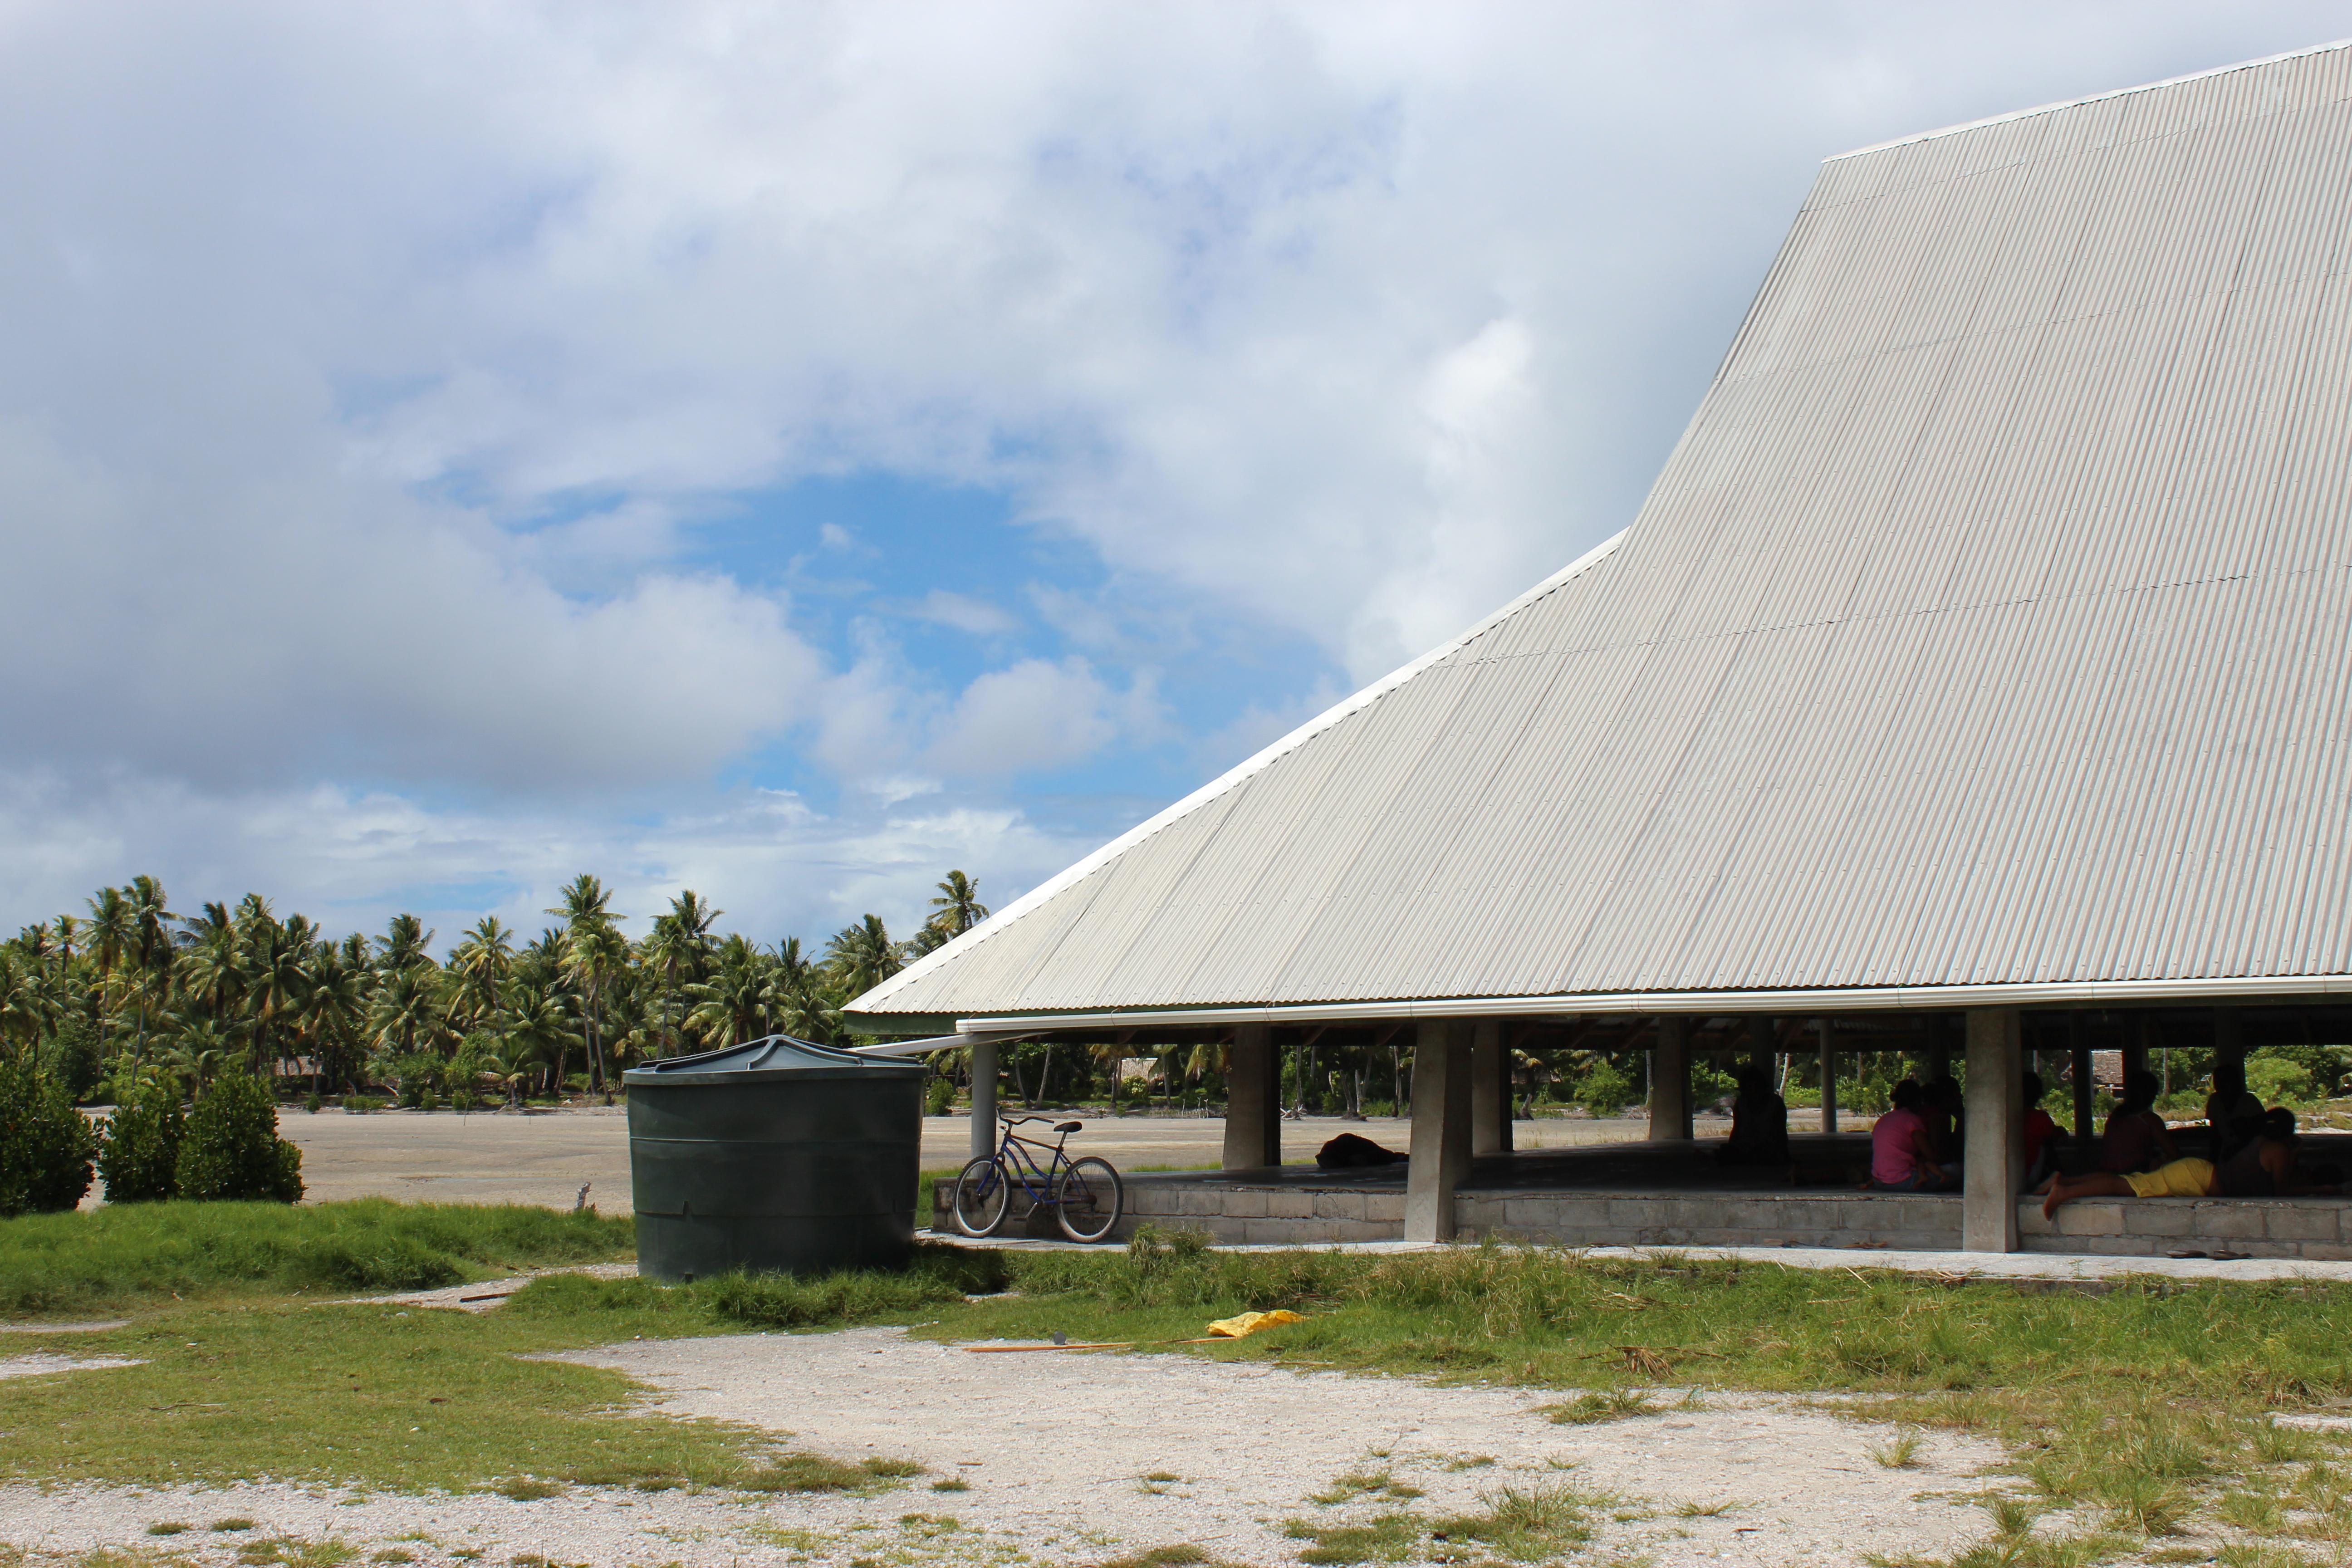 Description rainwater harvesting system jpg - File Rainwater Harvesting Systems In Kiribati 10715703914 Jpg